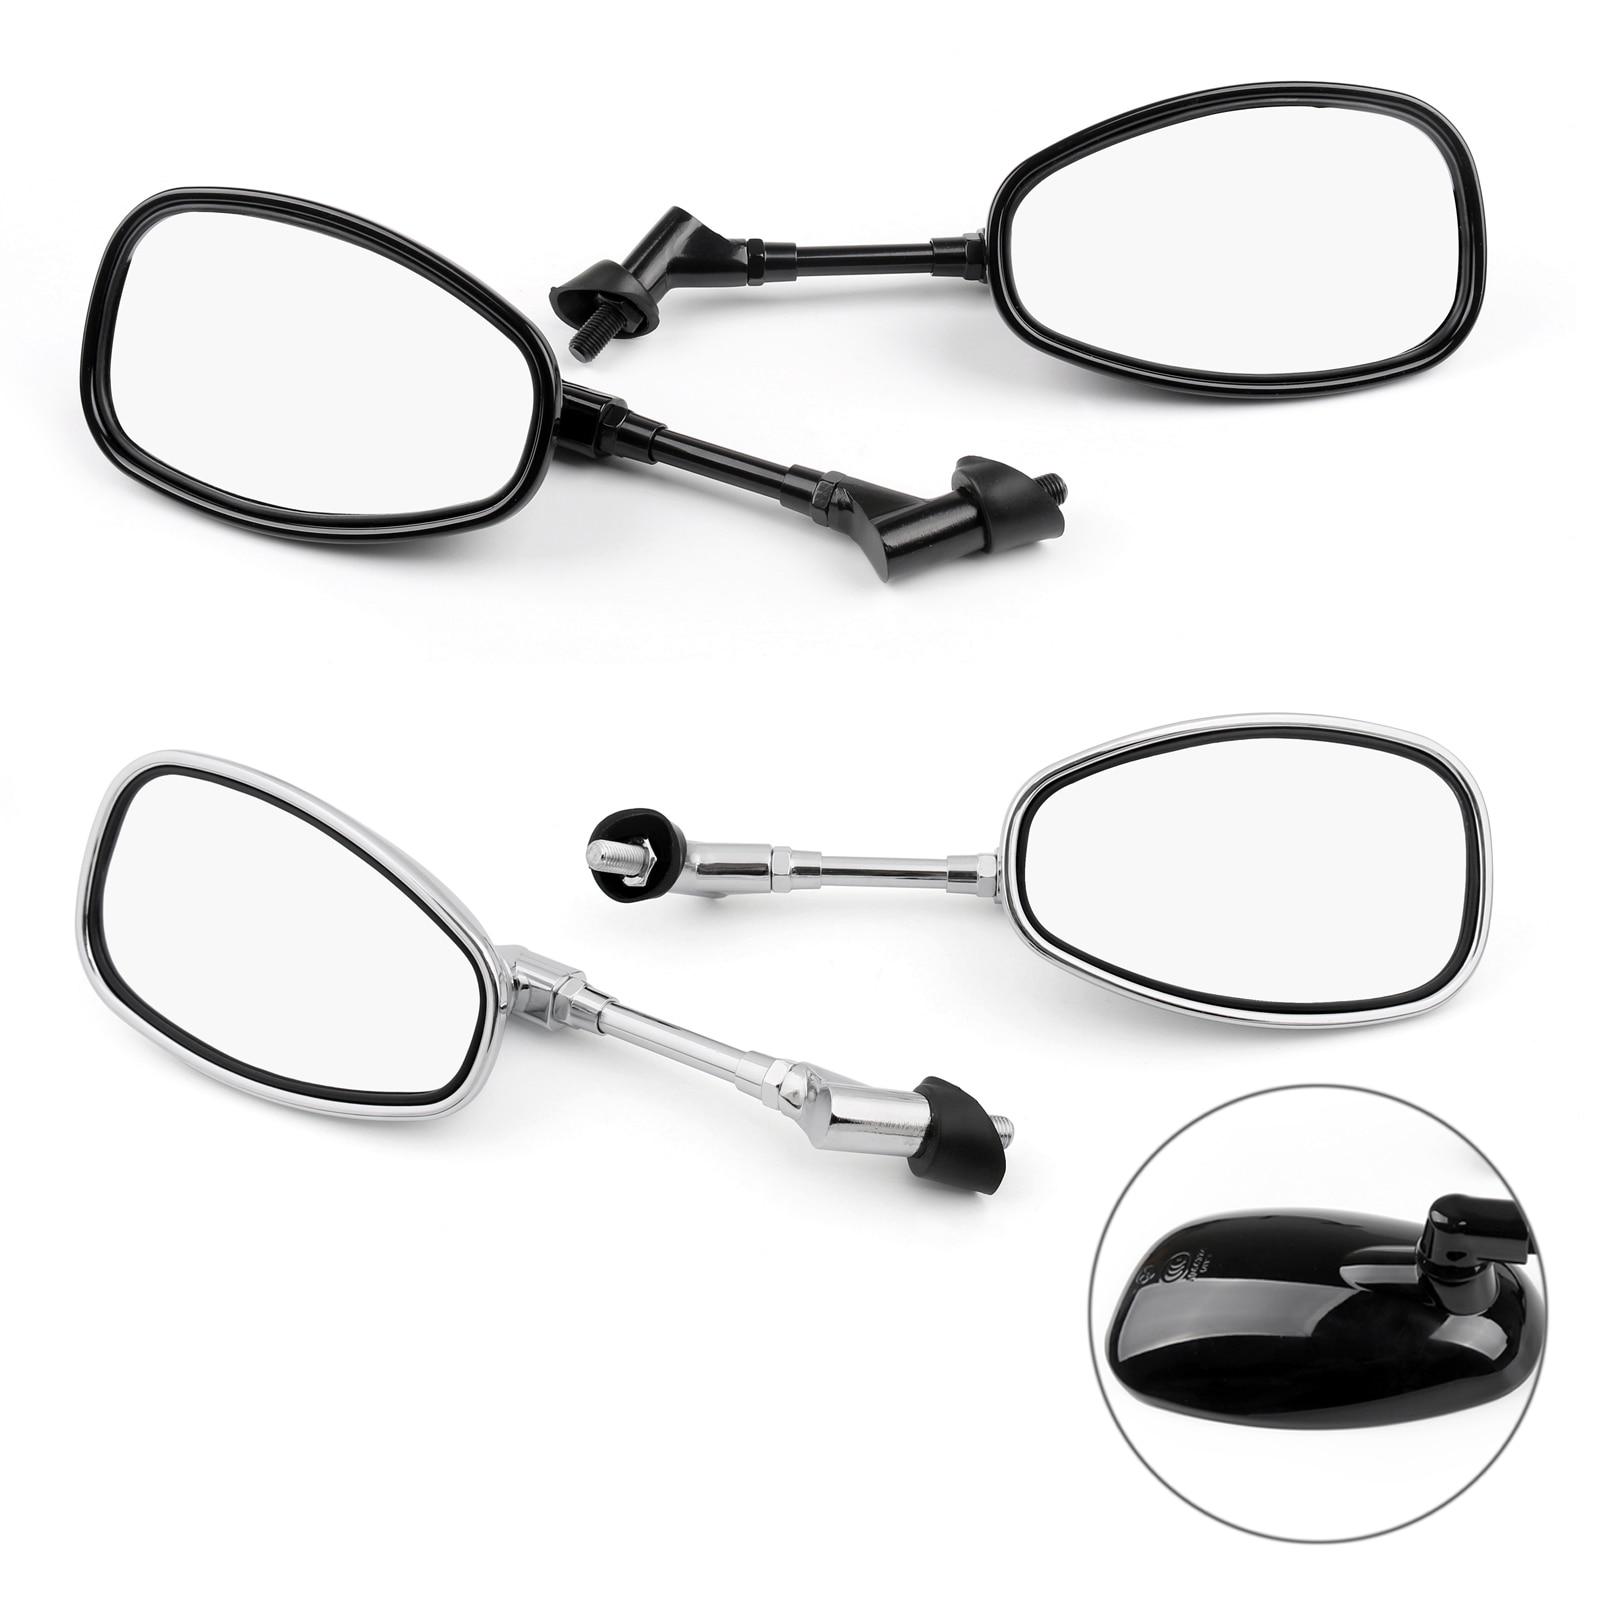 Artudatech 10mm Motocycle Rear View Mirrors For Suzuki GSF250 Bandit 250/400/600 SV1000 Motorbike Ac